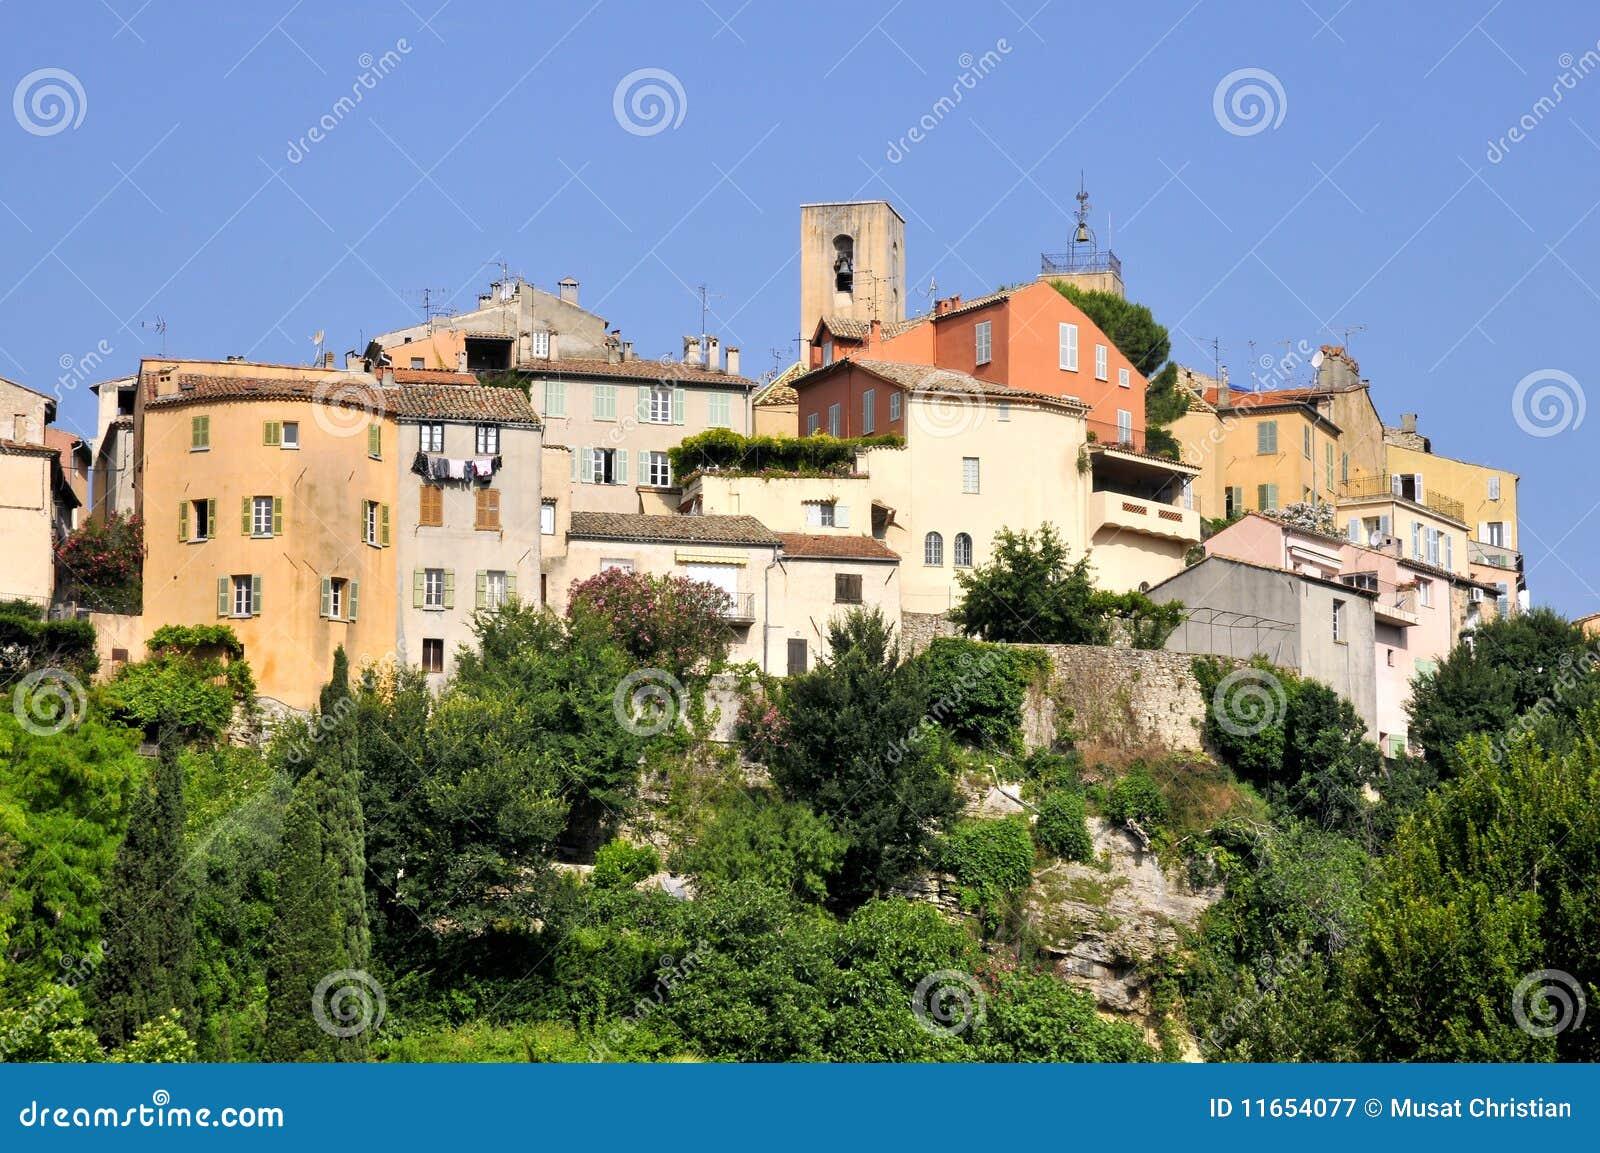 Village of Biot in France